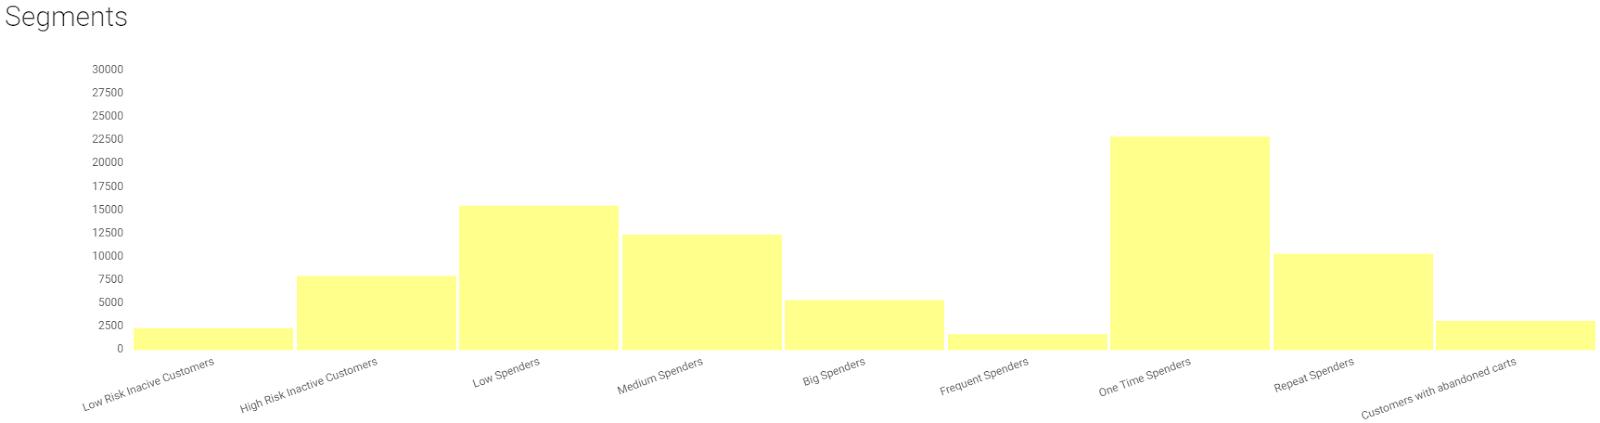 audience segmentation in edrone crm